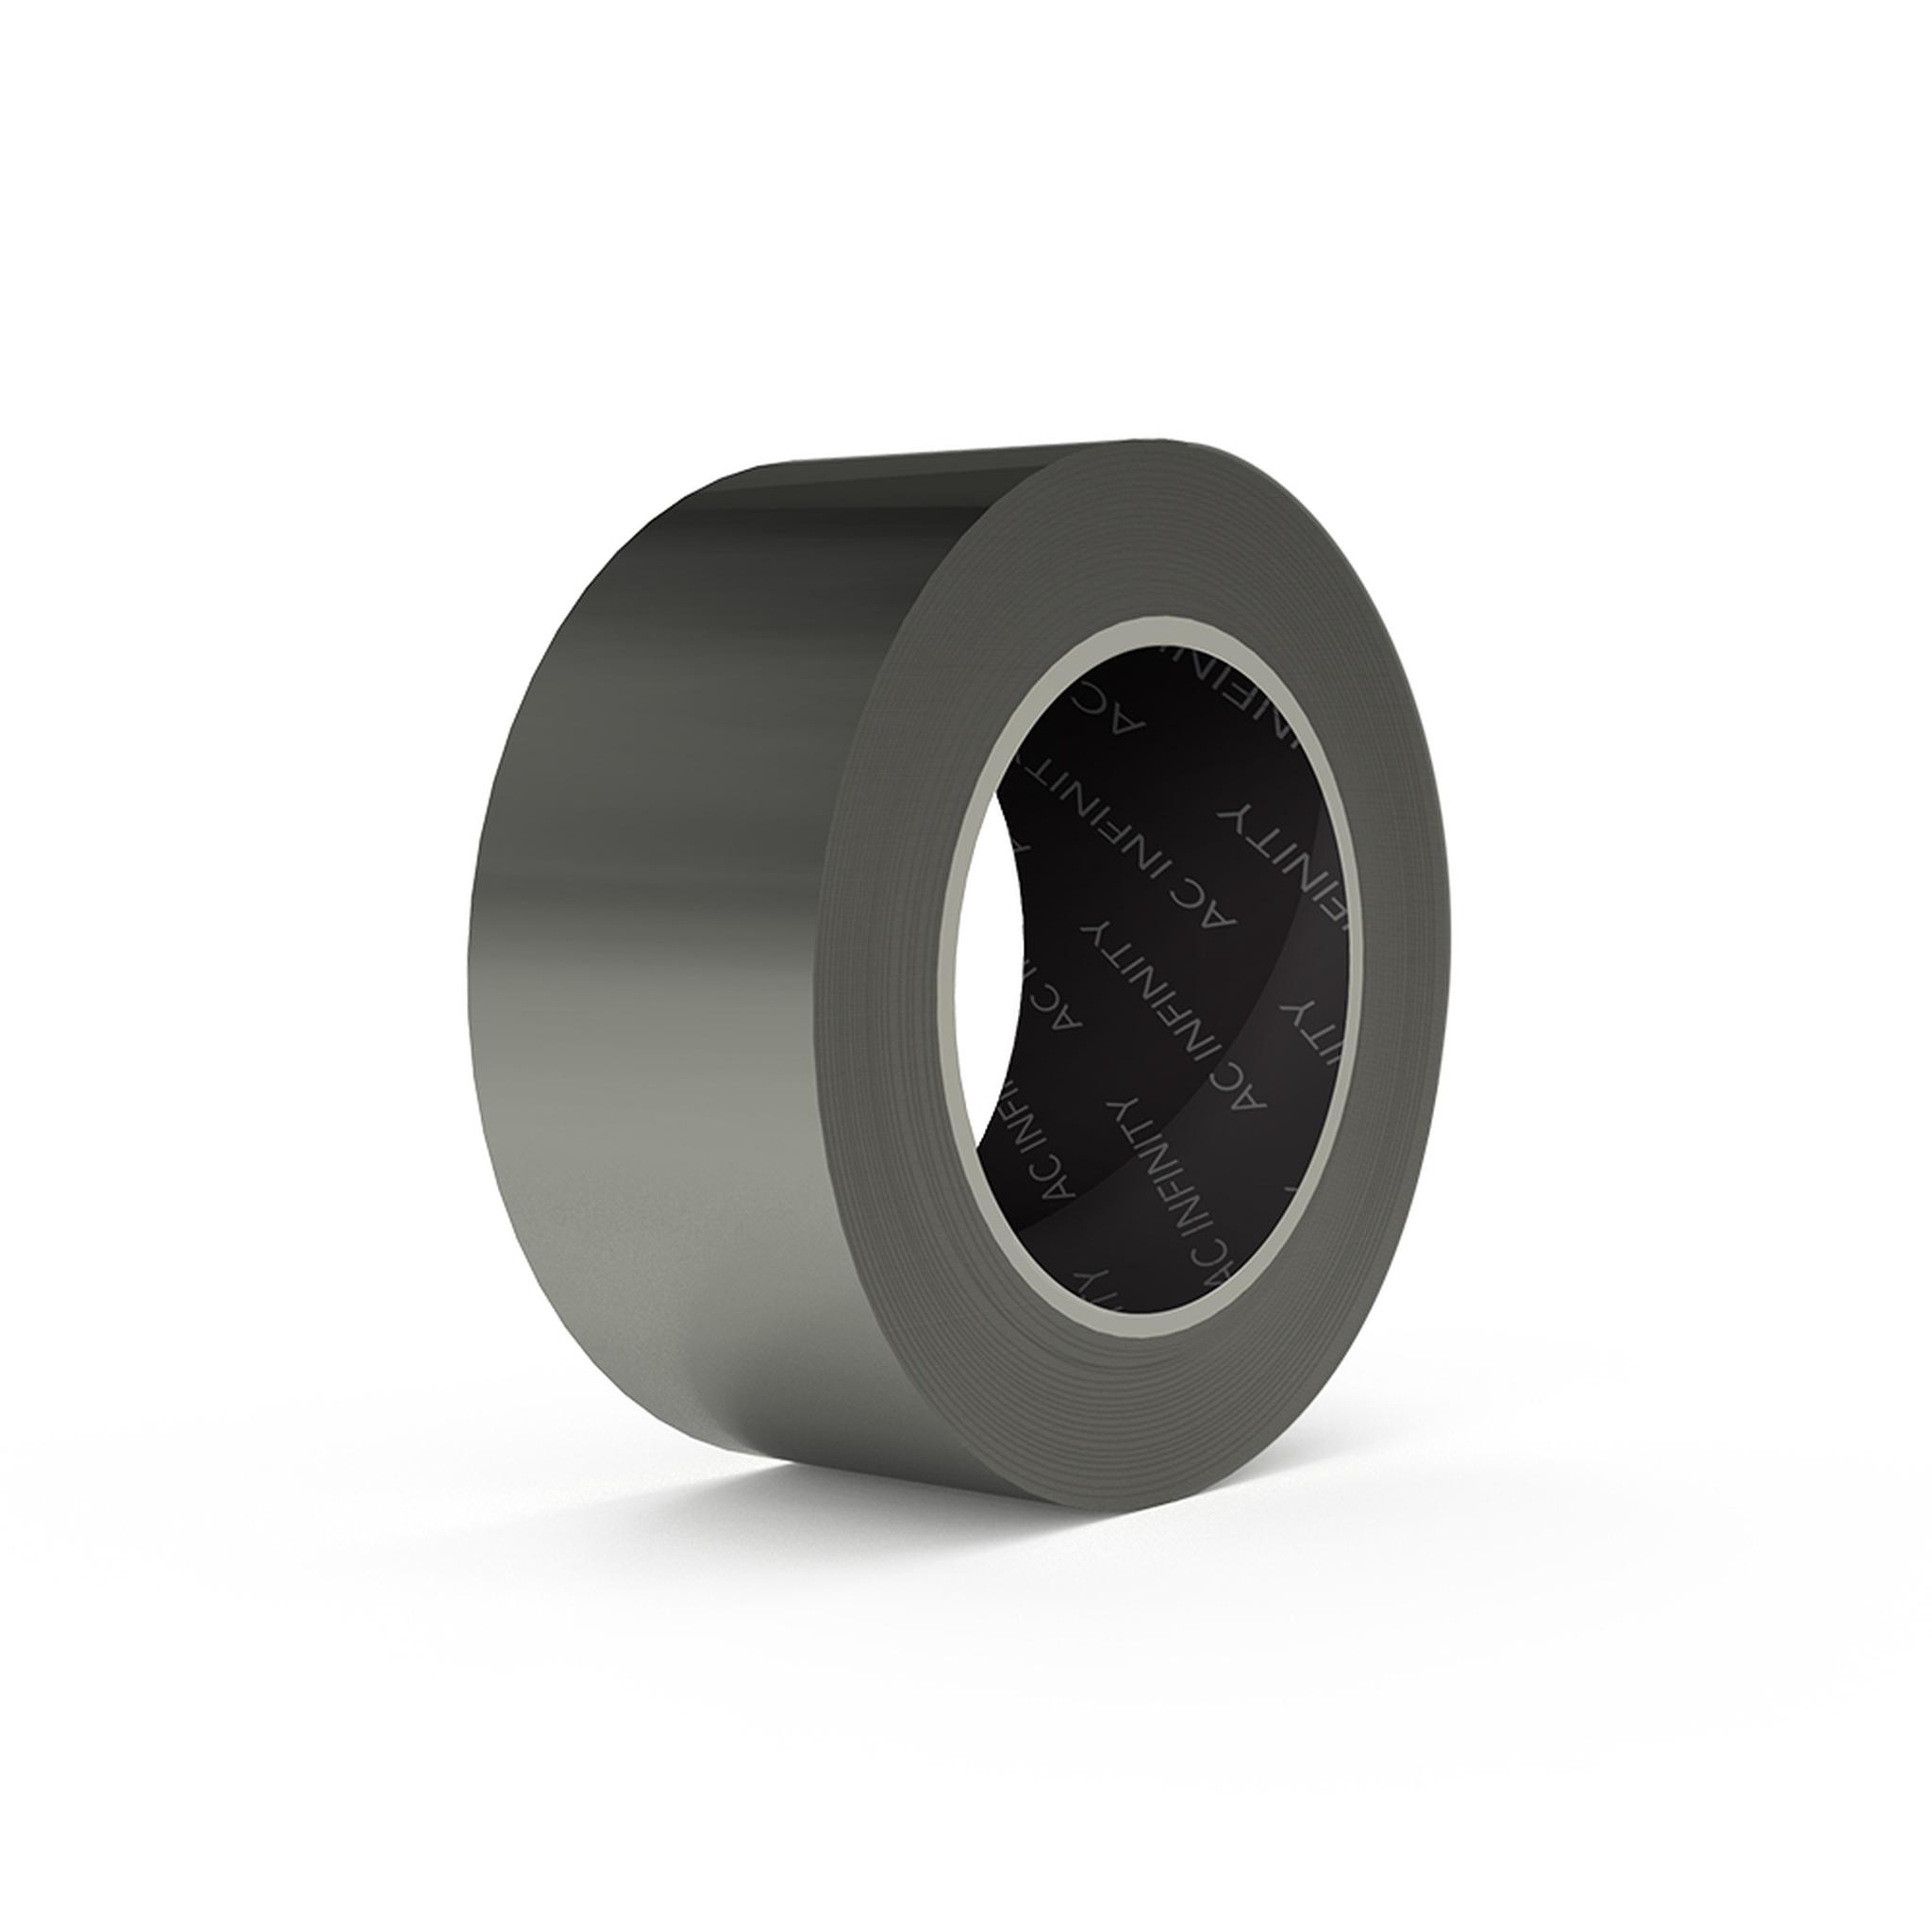 AC Infinity Ducting Tape 70-Yard